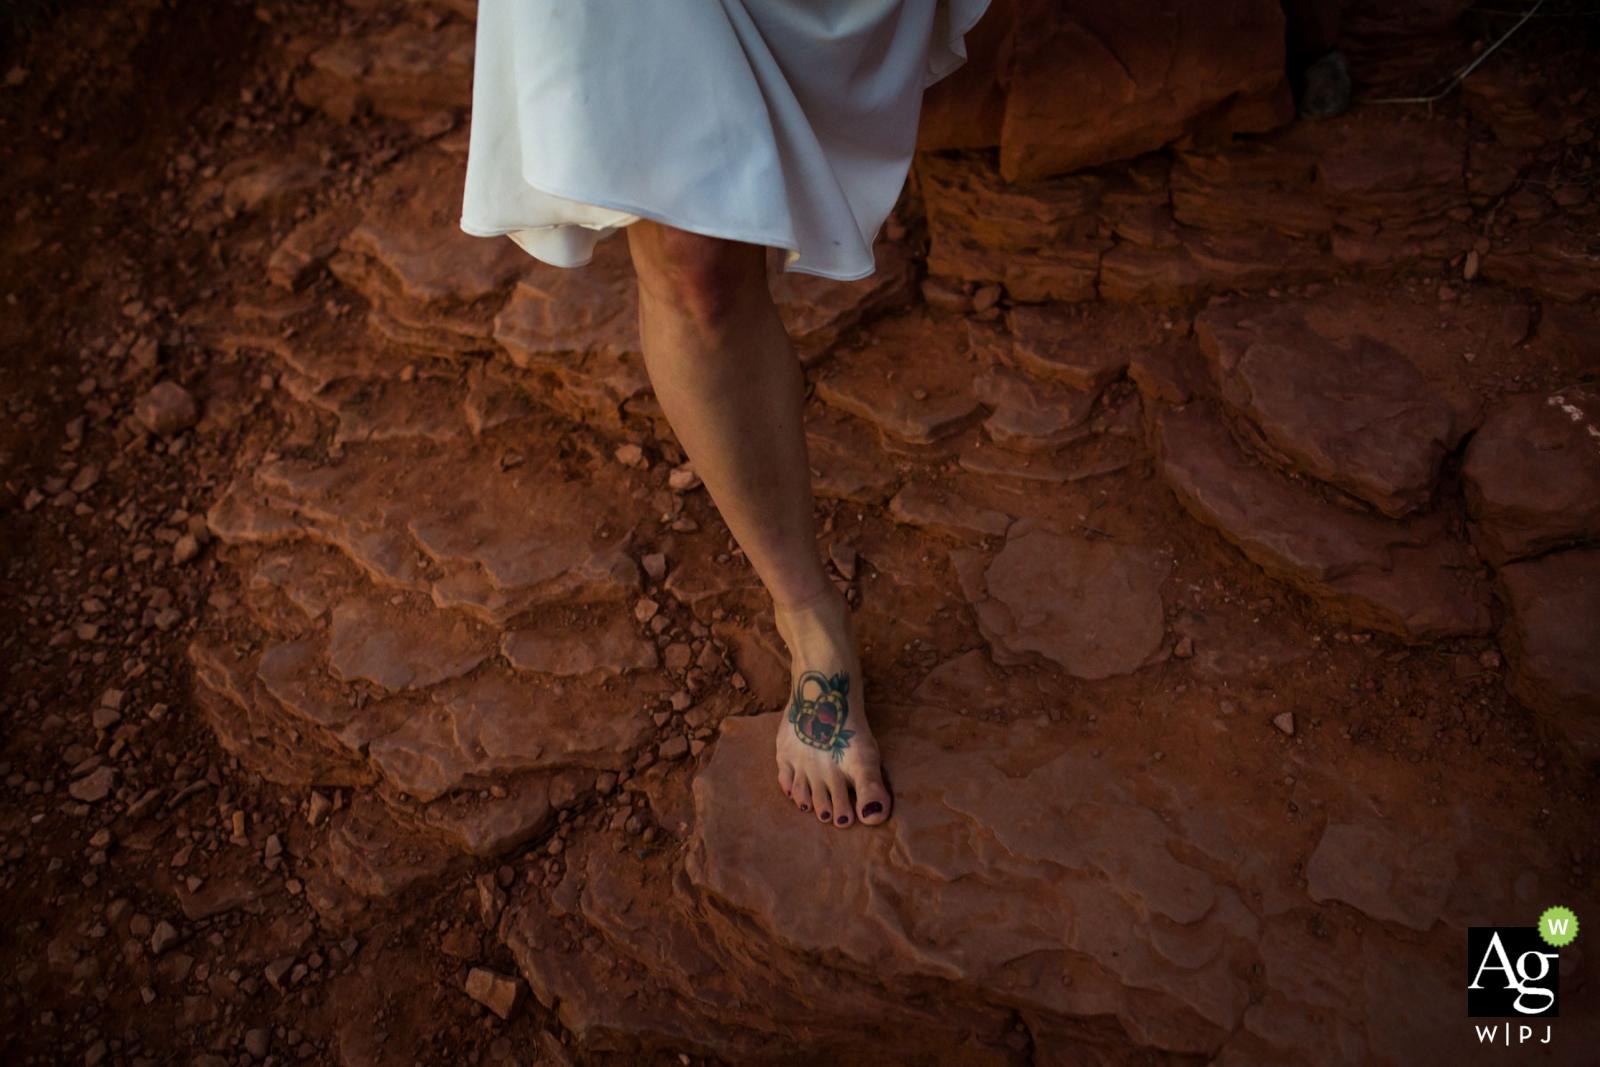 Bridal tattoo, Sedona bride - Barefoot bride walking in Sedona